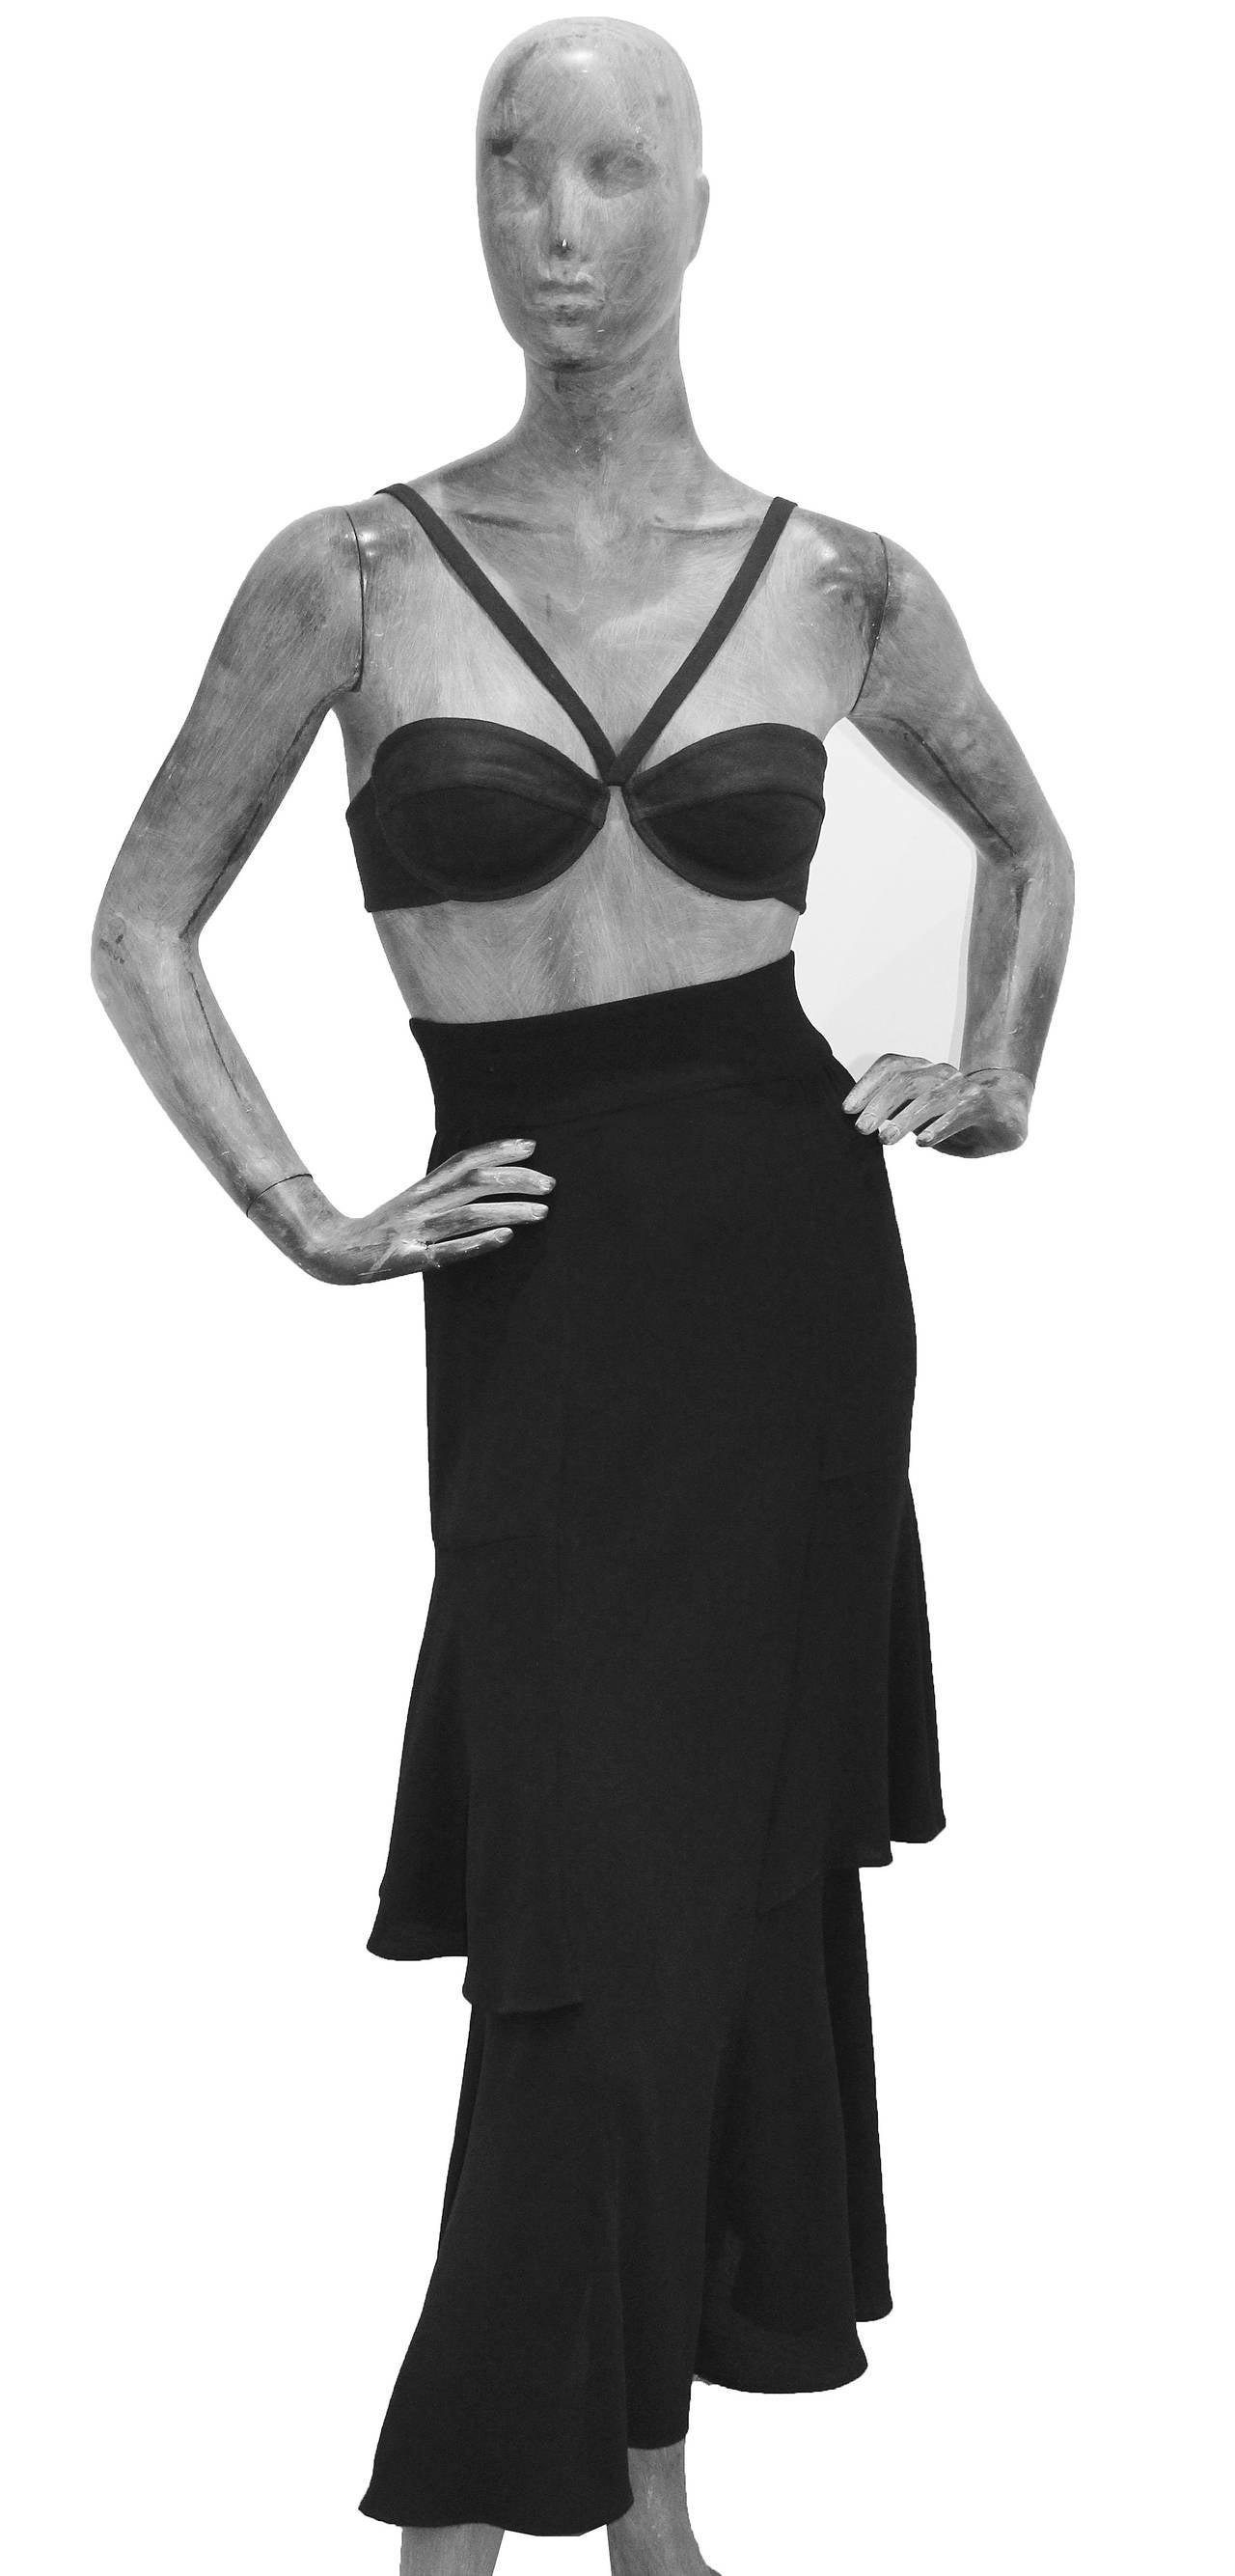 Ossie Clark High Waist Black Moss Crepe Skirt With Peplum Inserts c.1970 4